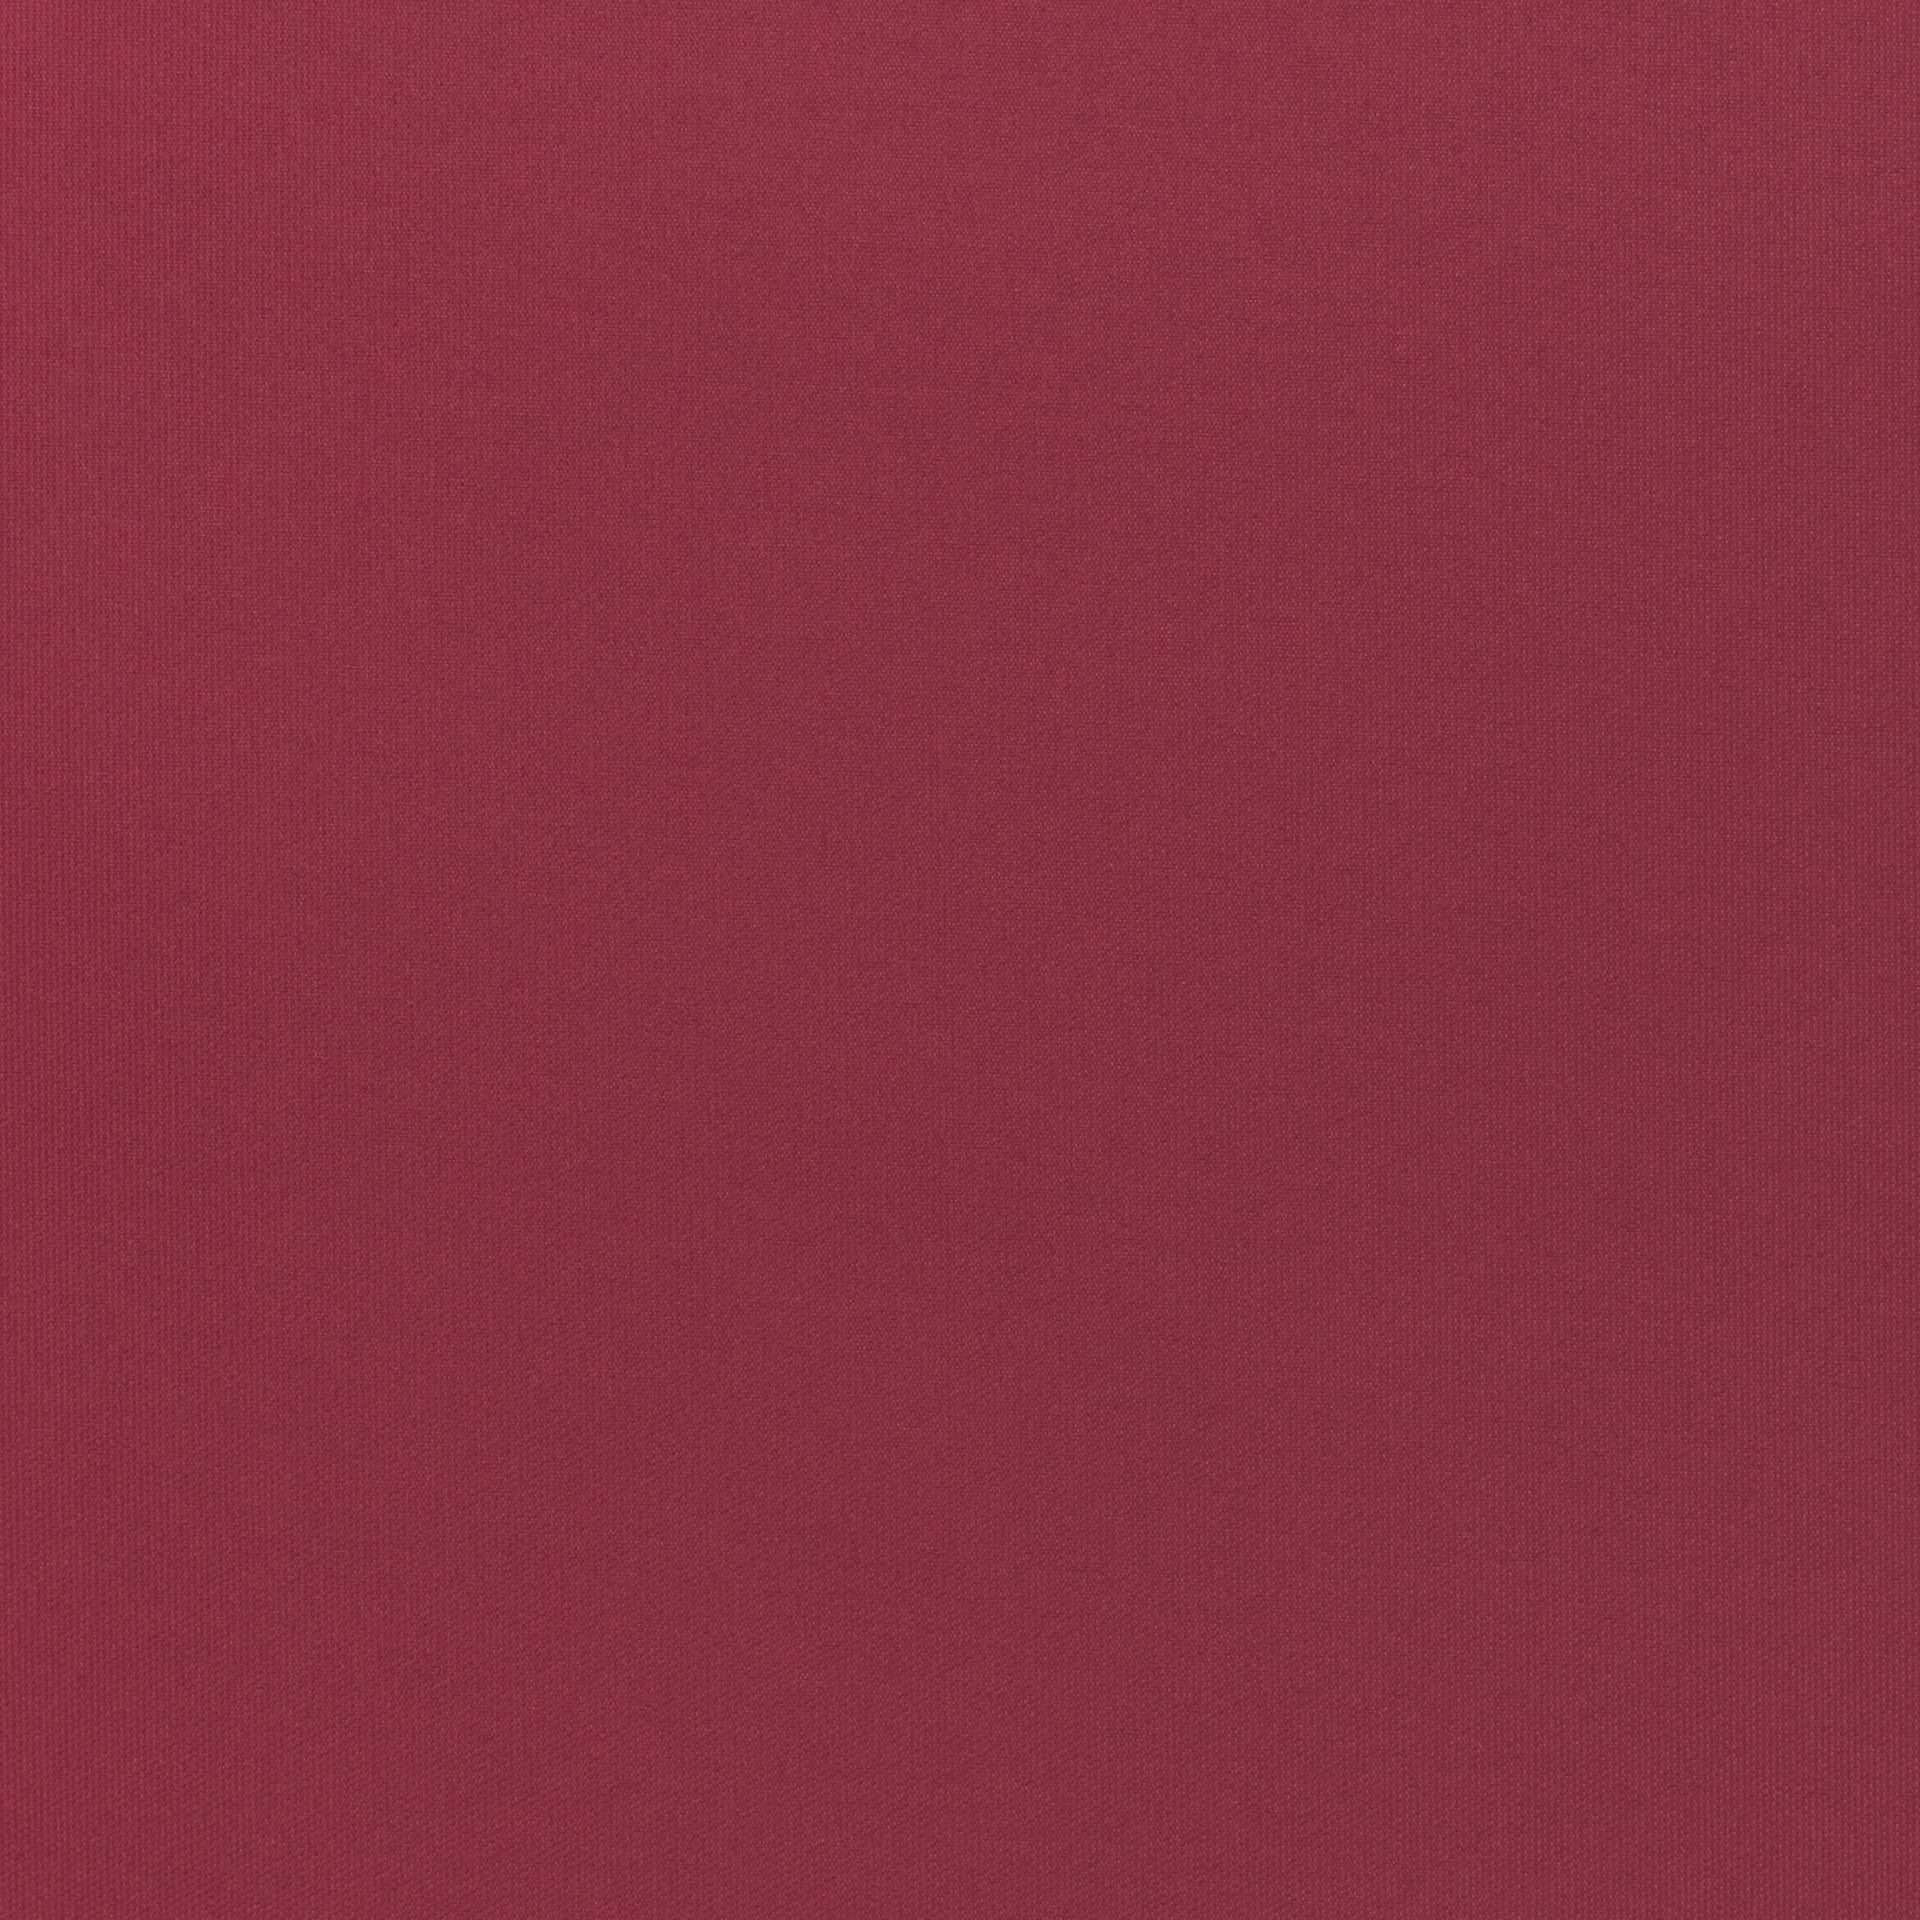 Tenda a rullo oscurante INSPIRE Tokyo rosso 140 x 160 cm - 4